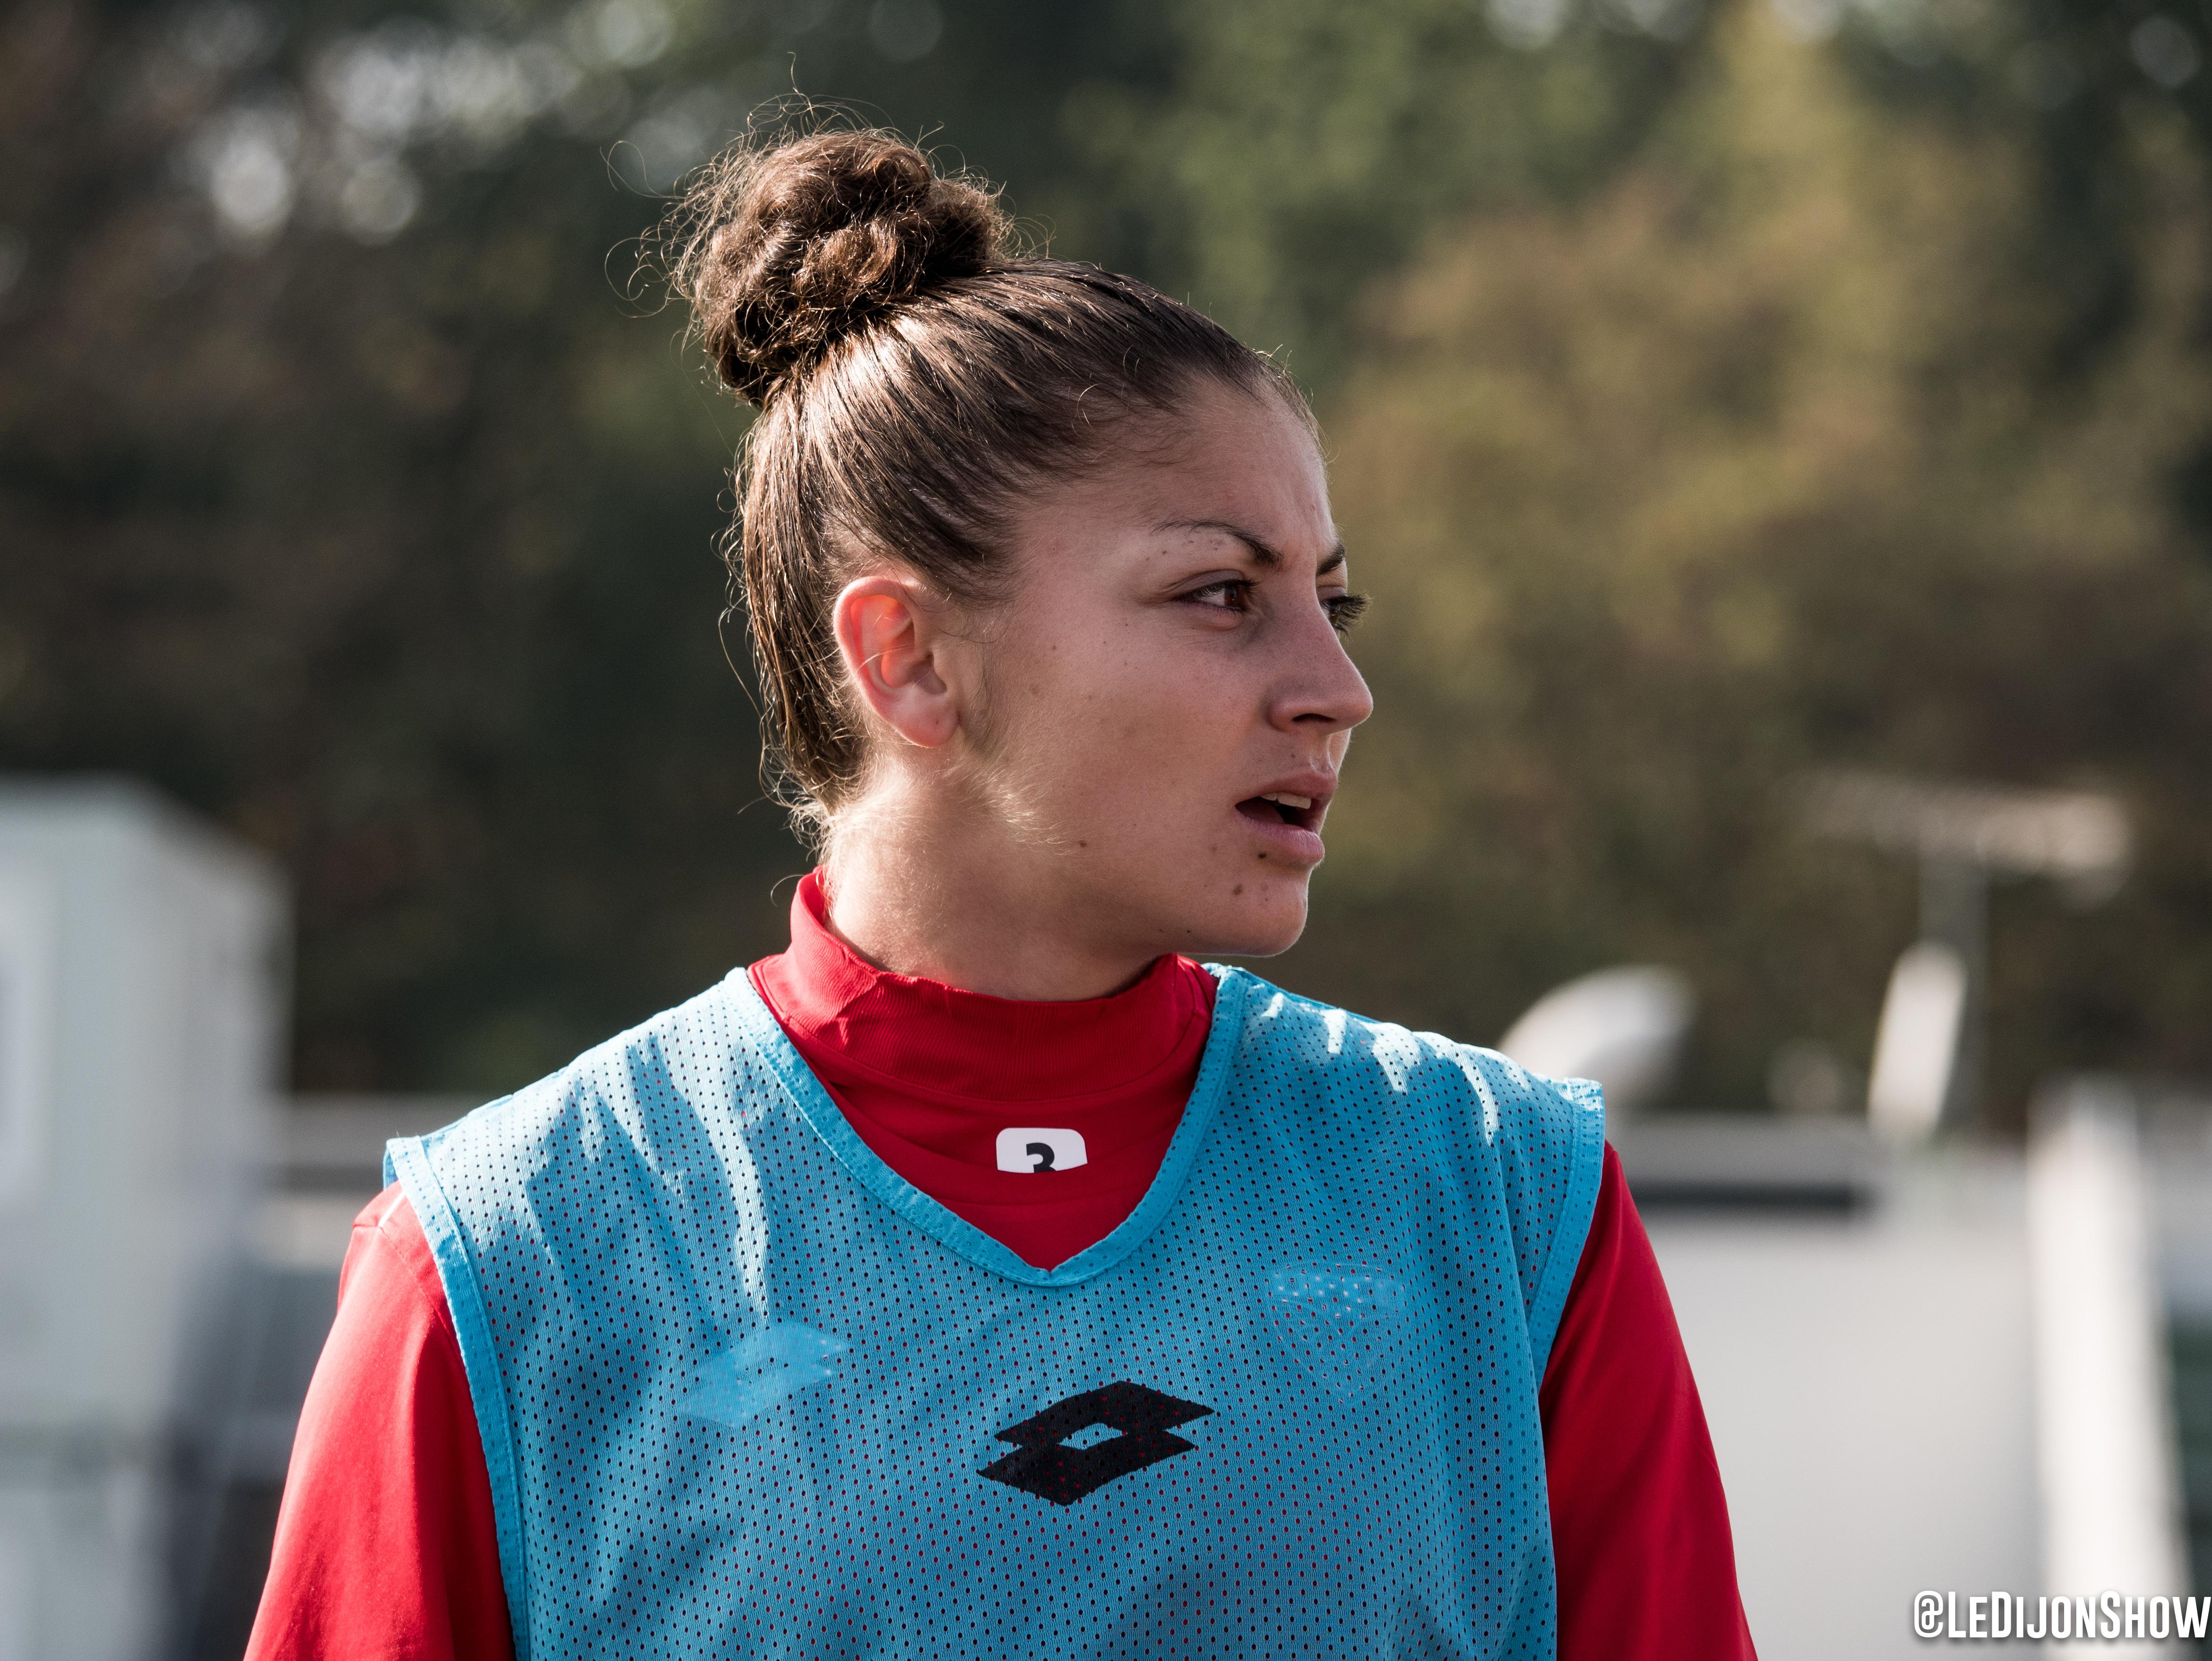 Elodie Nakkach